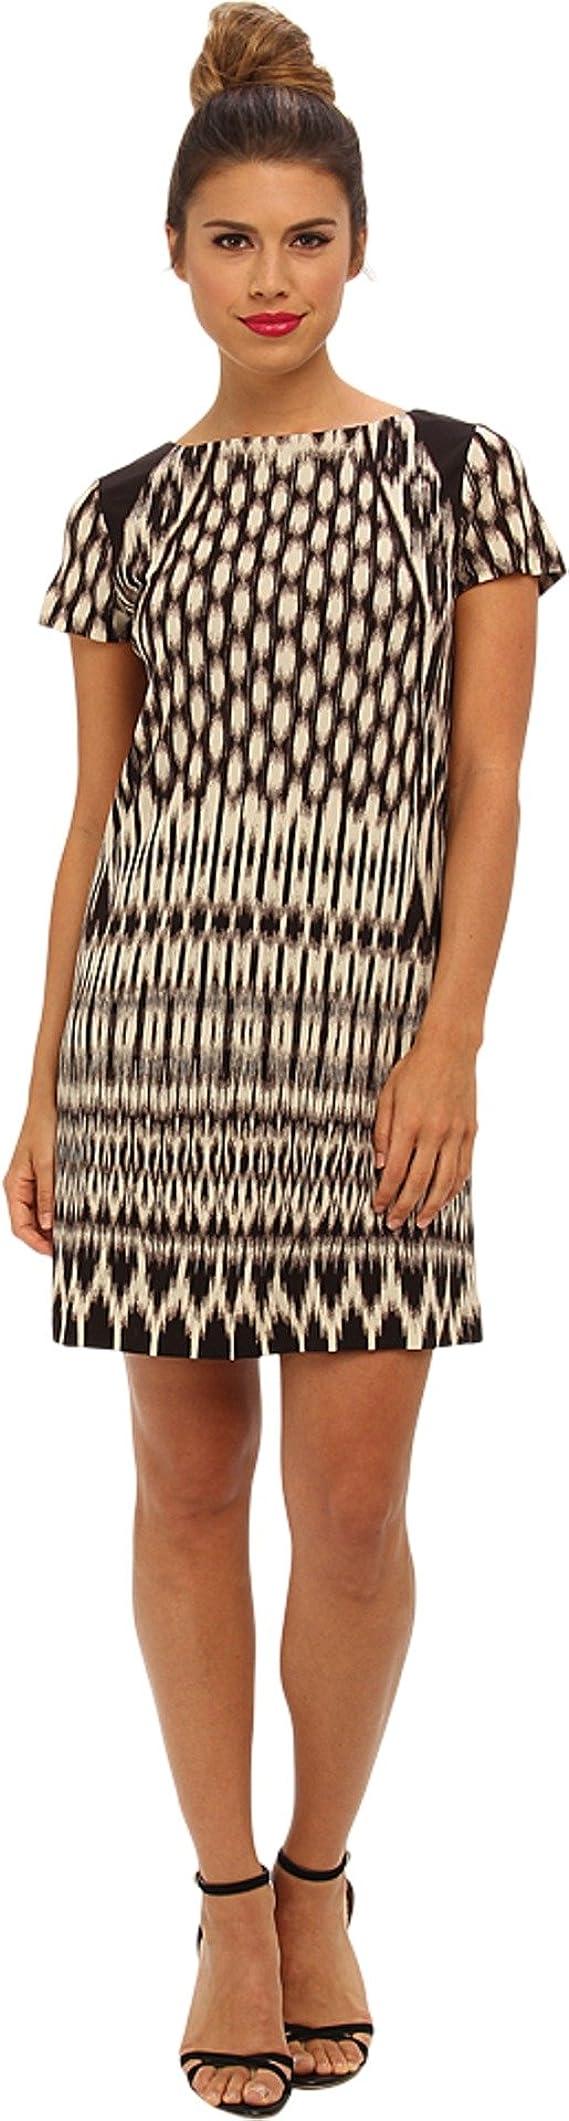 Nicole Miller Women's Temple Ikat Short Sleeve Dress